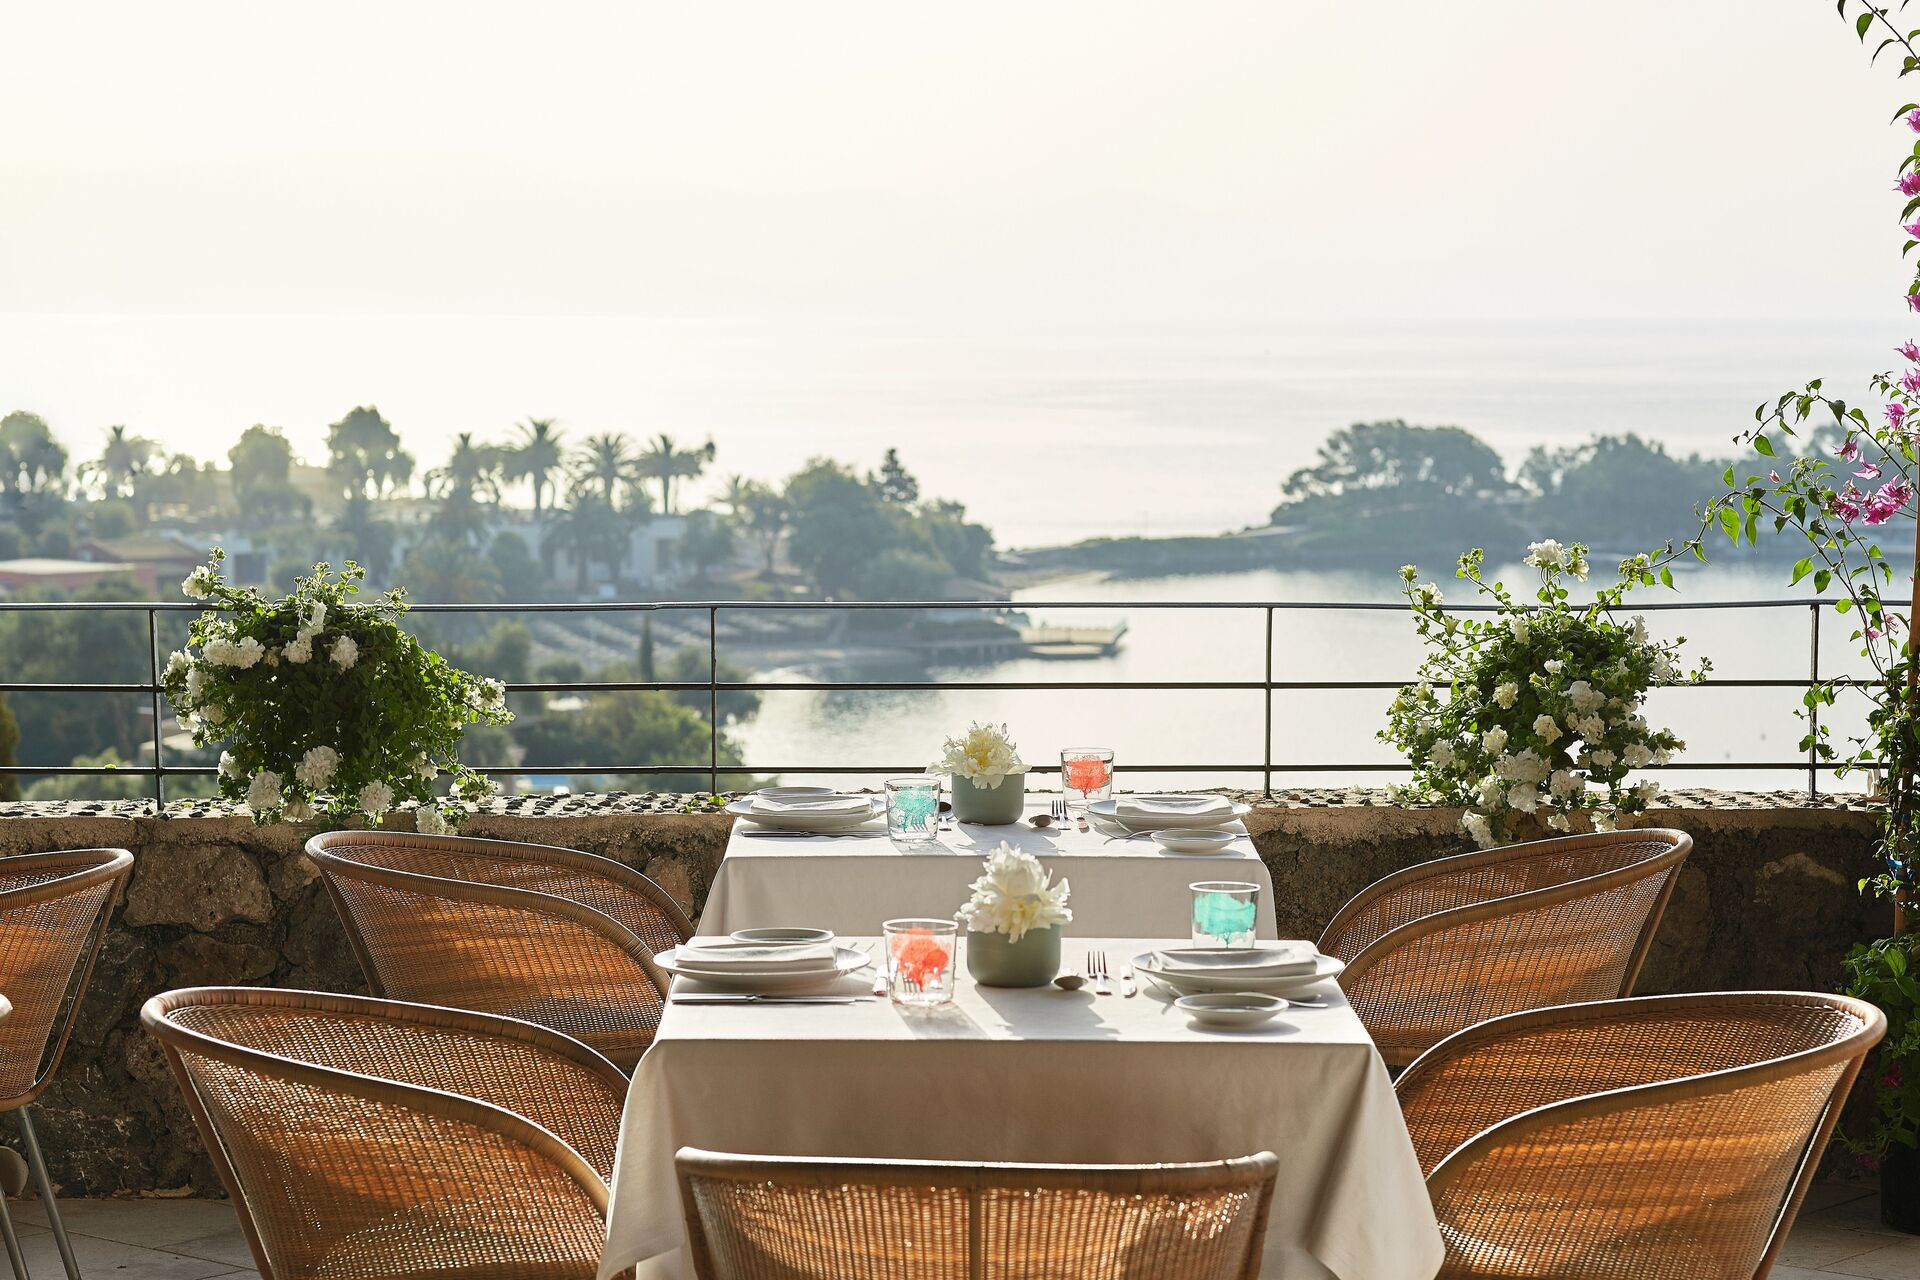 https://cms.satur.sk/data/imgs/tour_image/orig/09-mediterraneo-restaurant_72dpi-1946651.jpg